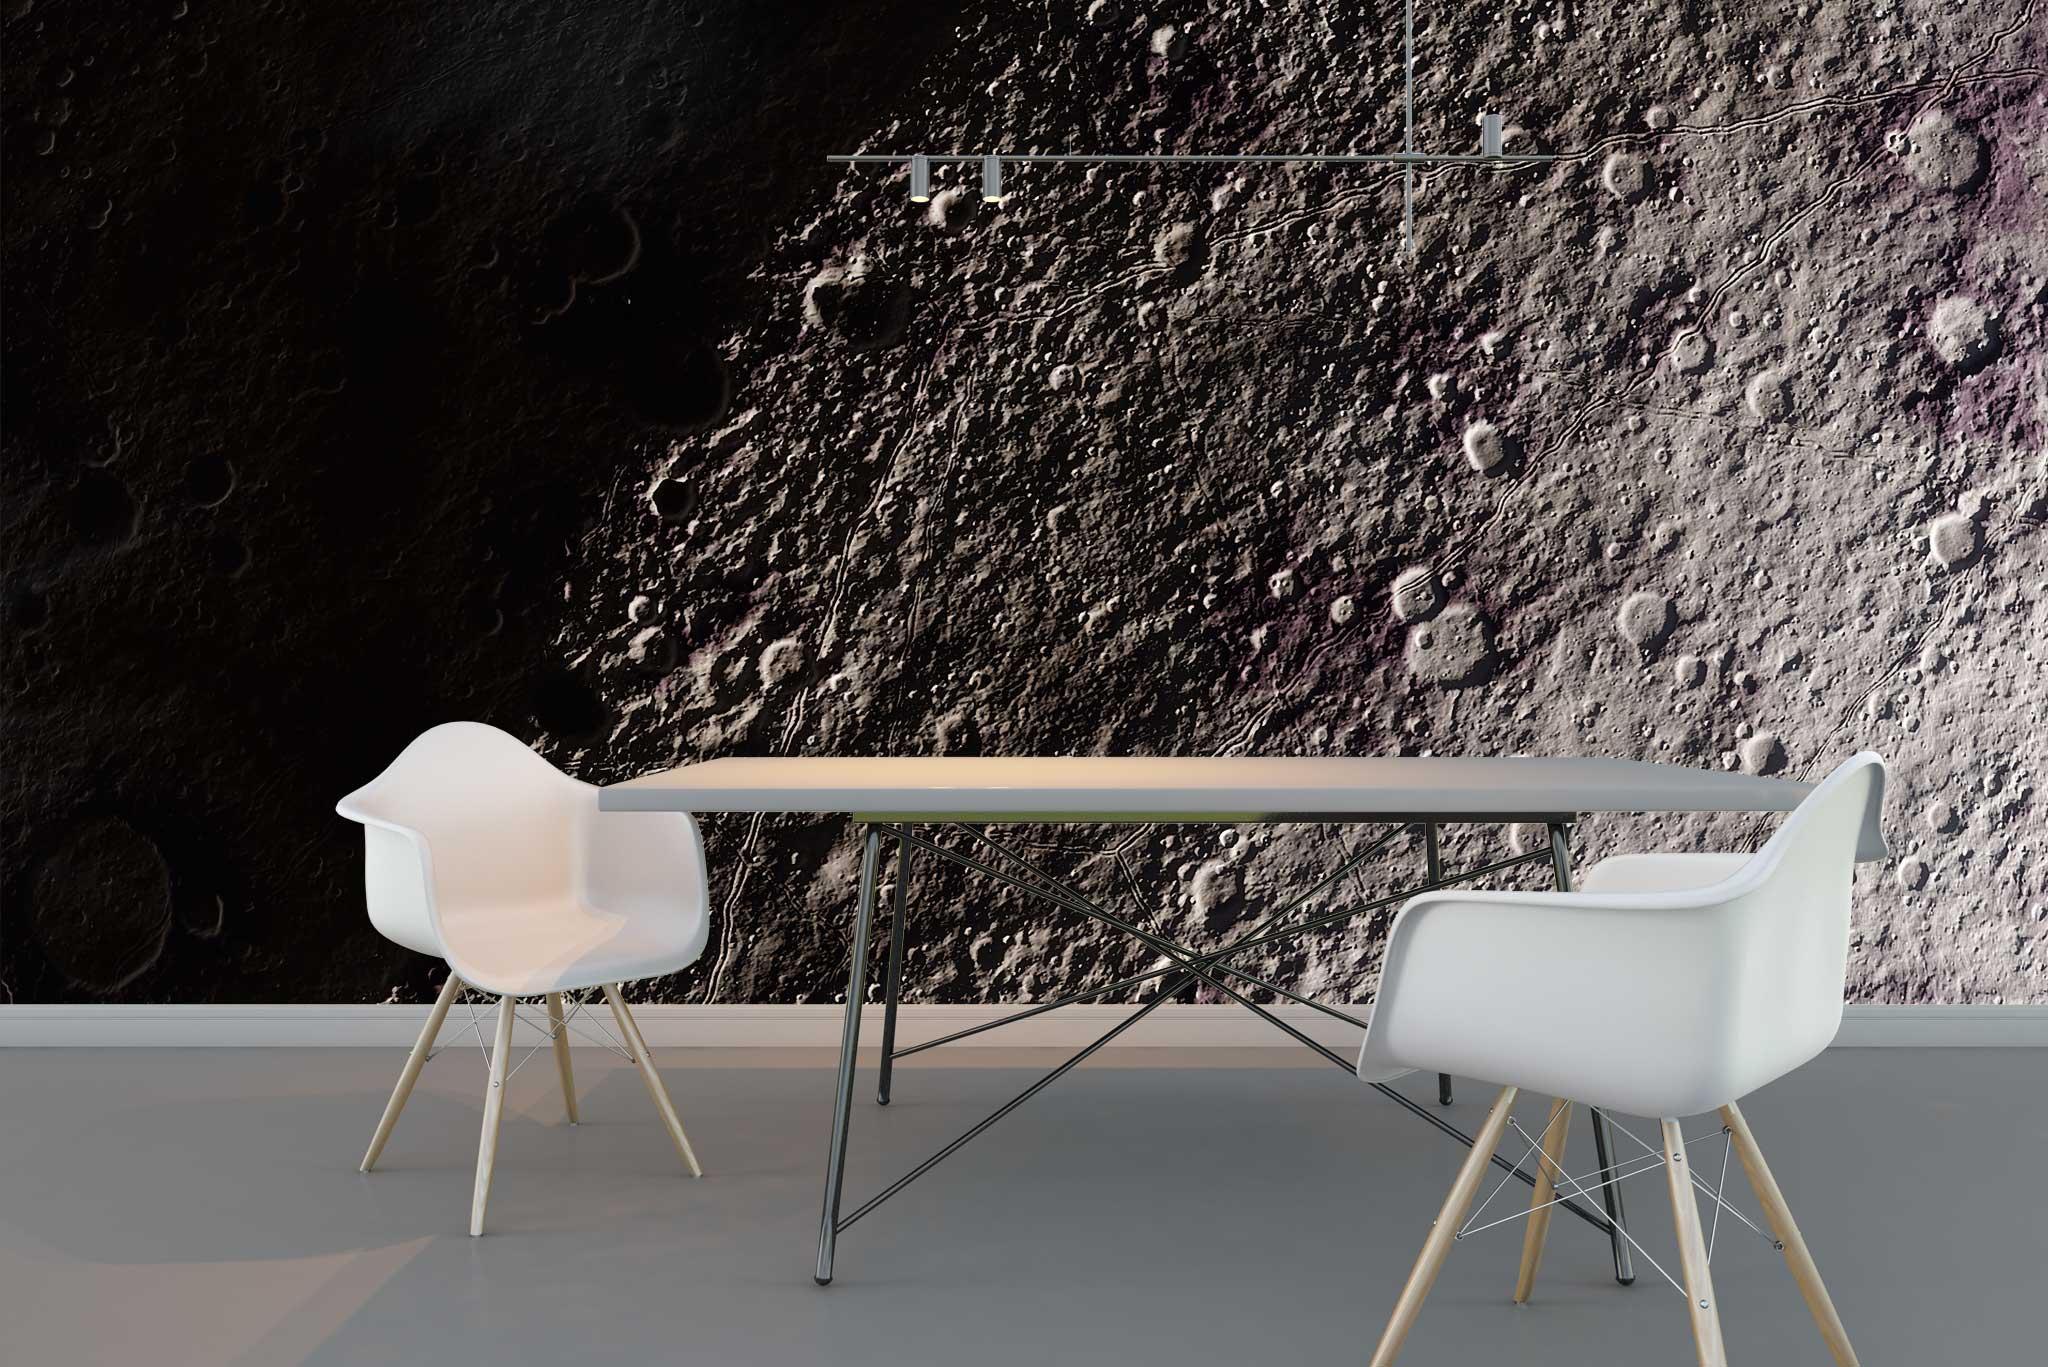 tapet-fototapet-comanda-personalizat-bucuresti-perete-special-lux-model-fotografie-suprafata-lunii